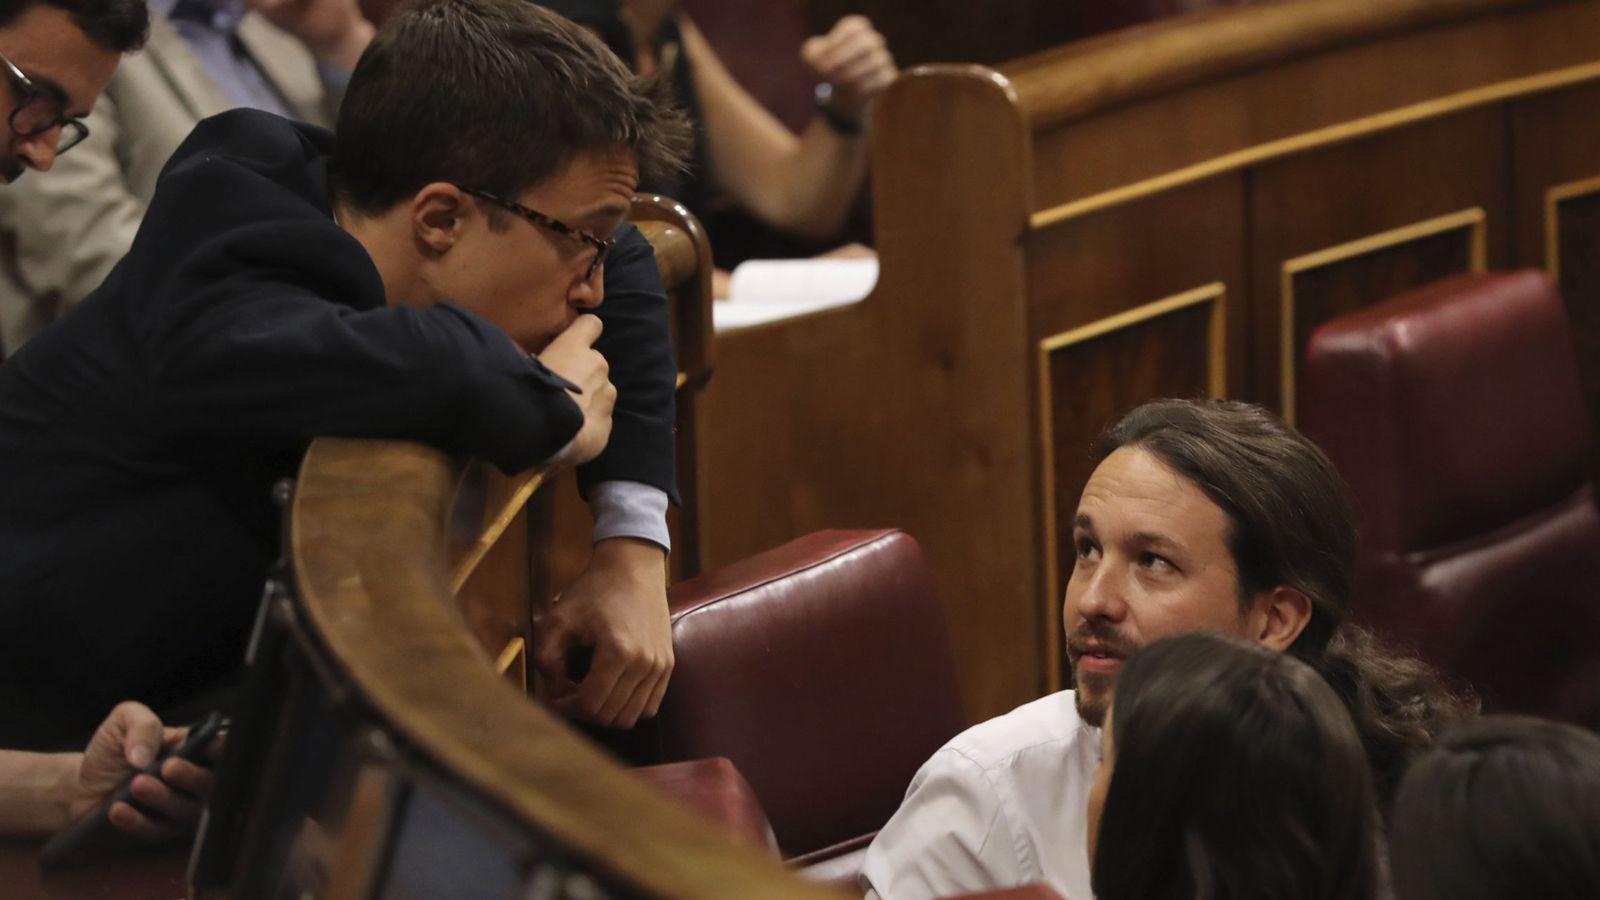 Foto: El diputado de Podemos Íñigo Errejón (i), conversa con el líder de Podemos, Pablo Iglesias (d). (EFE)